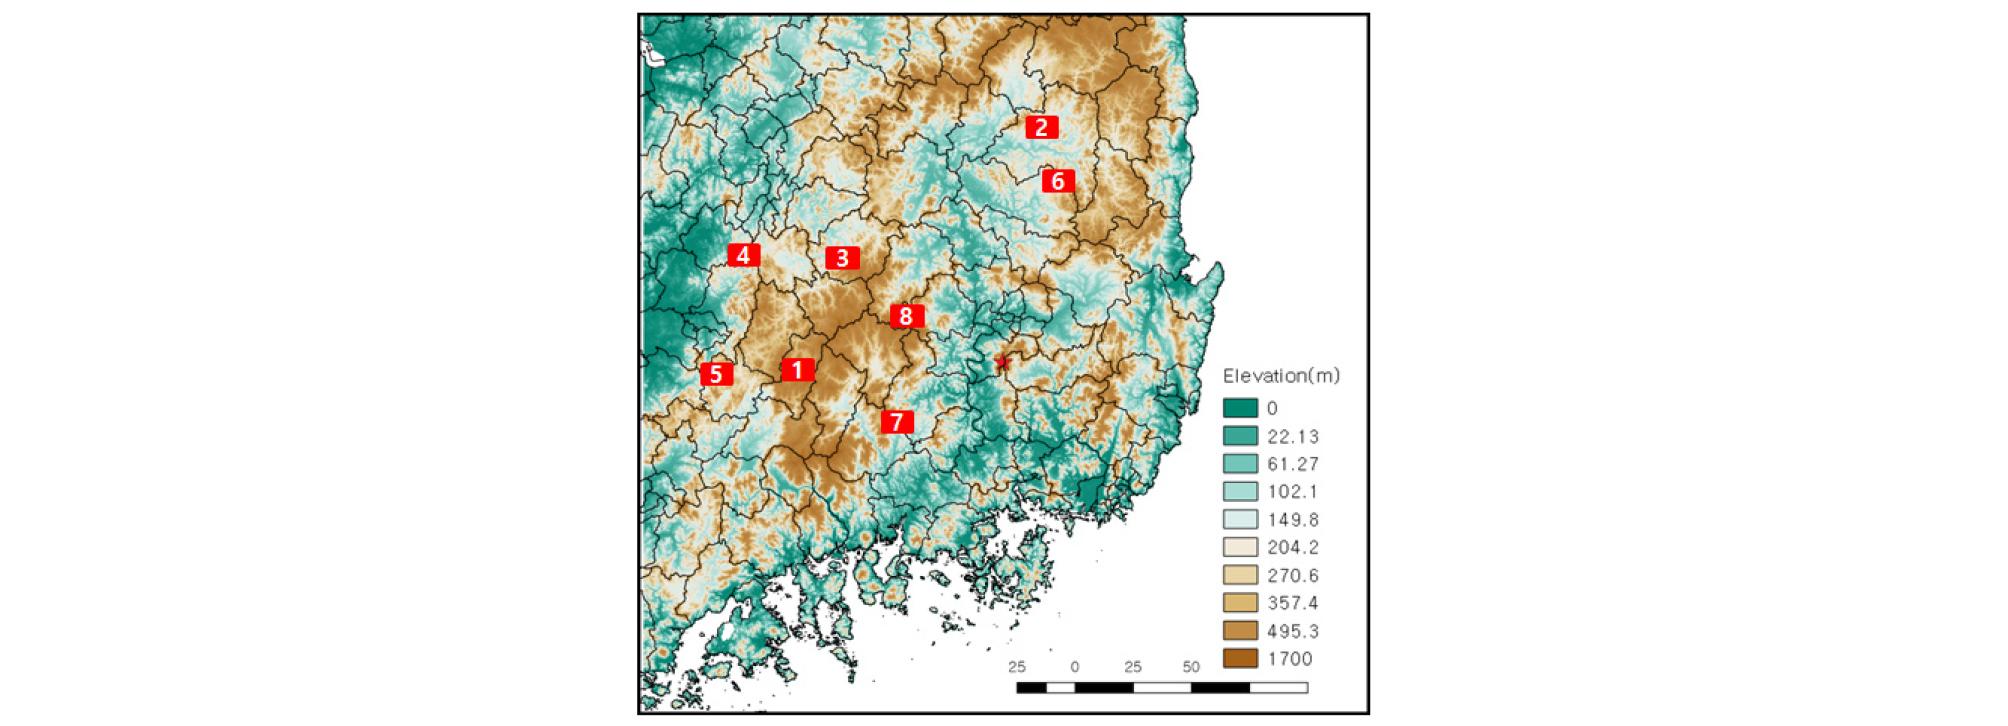 http://static.apub.kr/journalsite/sites/kwra/2020-053-04/N0200530408/images/kwra_53_04_08_F4.jpg